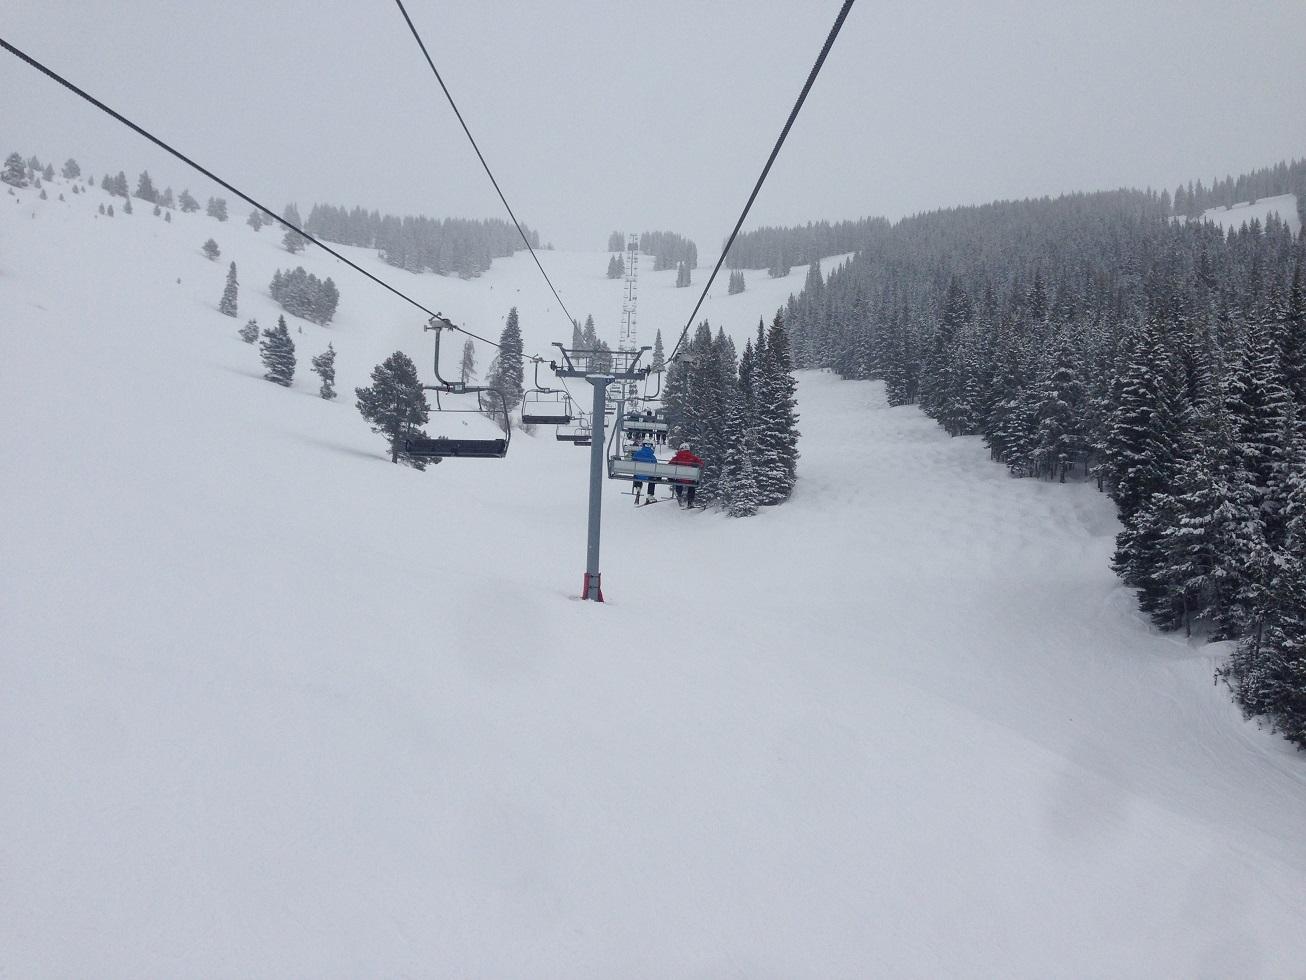 Vail滑雪场 (4).JPG